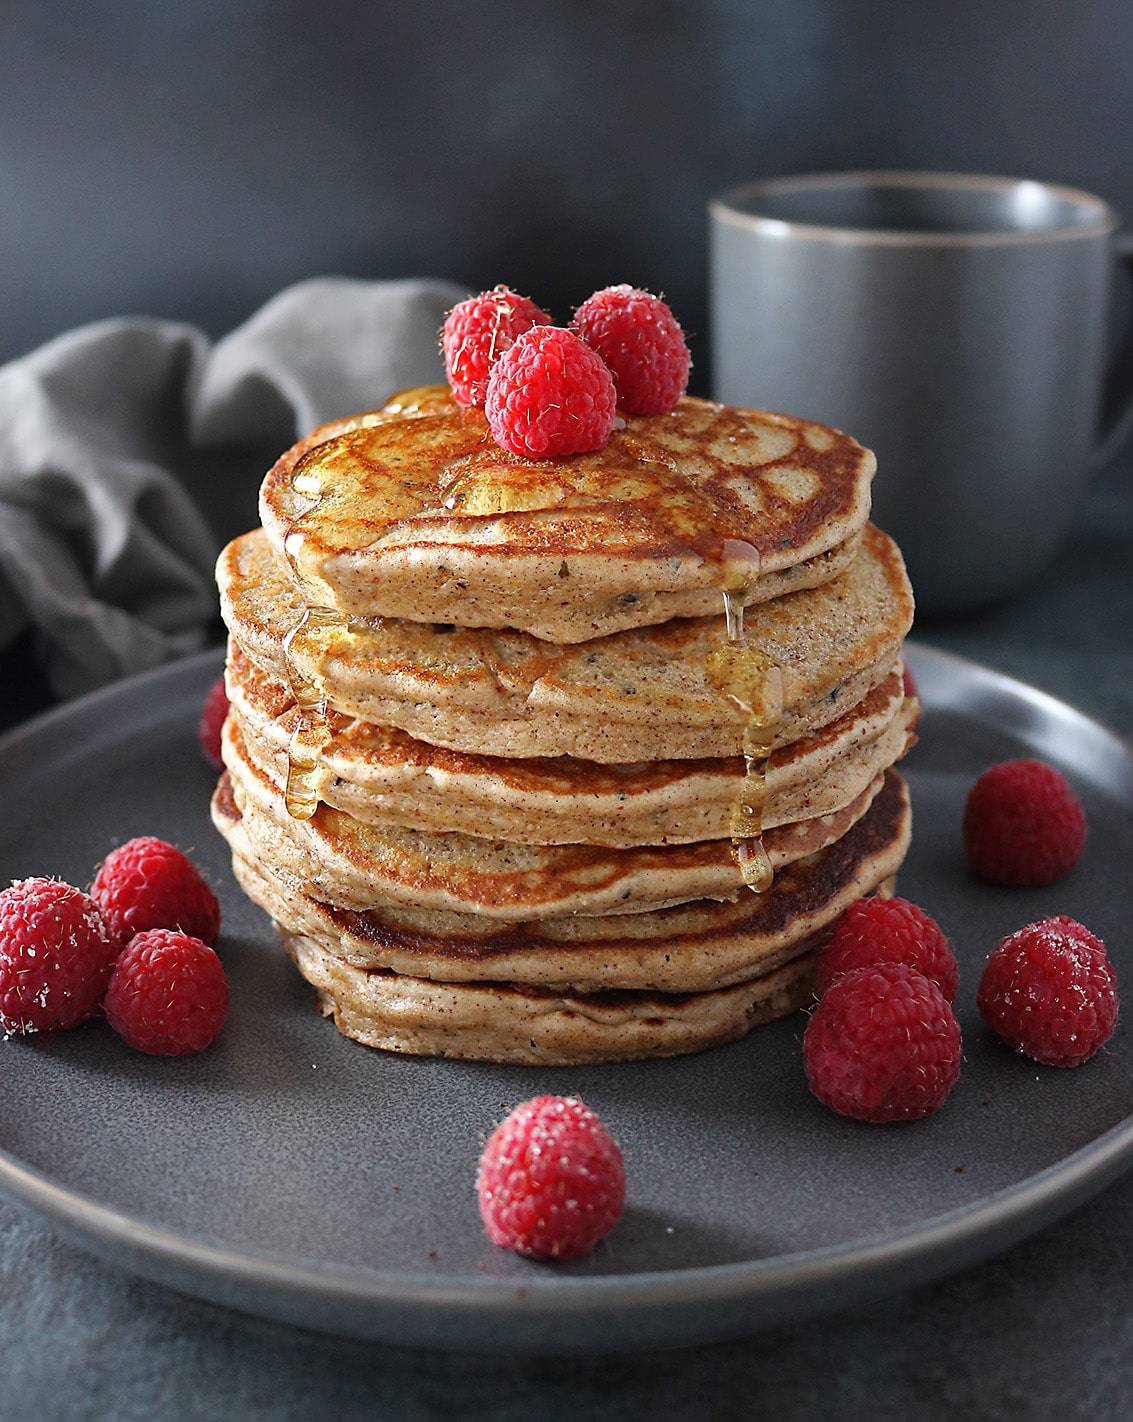 Stack of four Almond Hemp Pancakes with raspberries